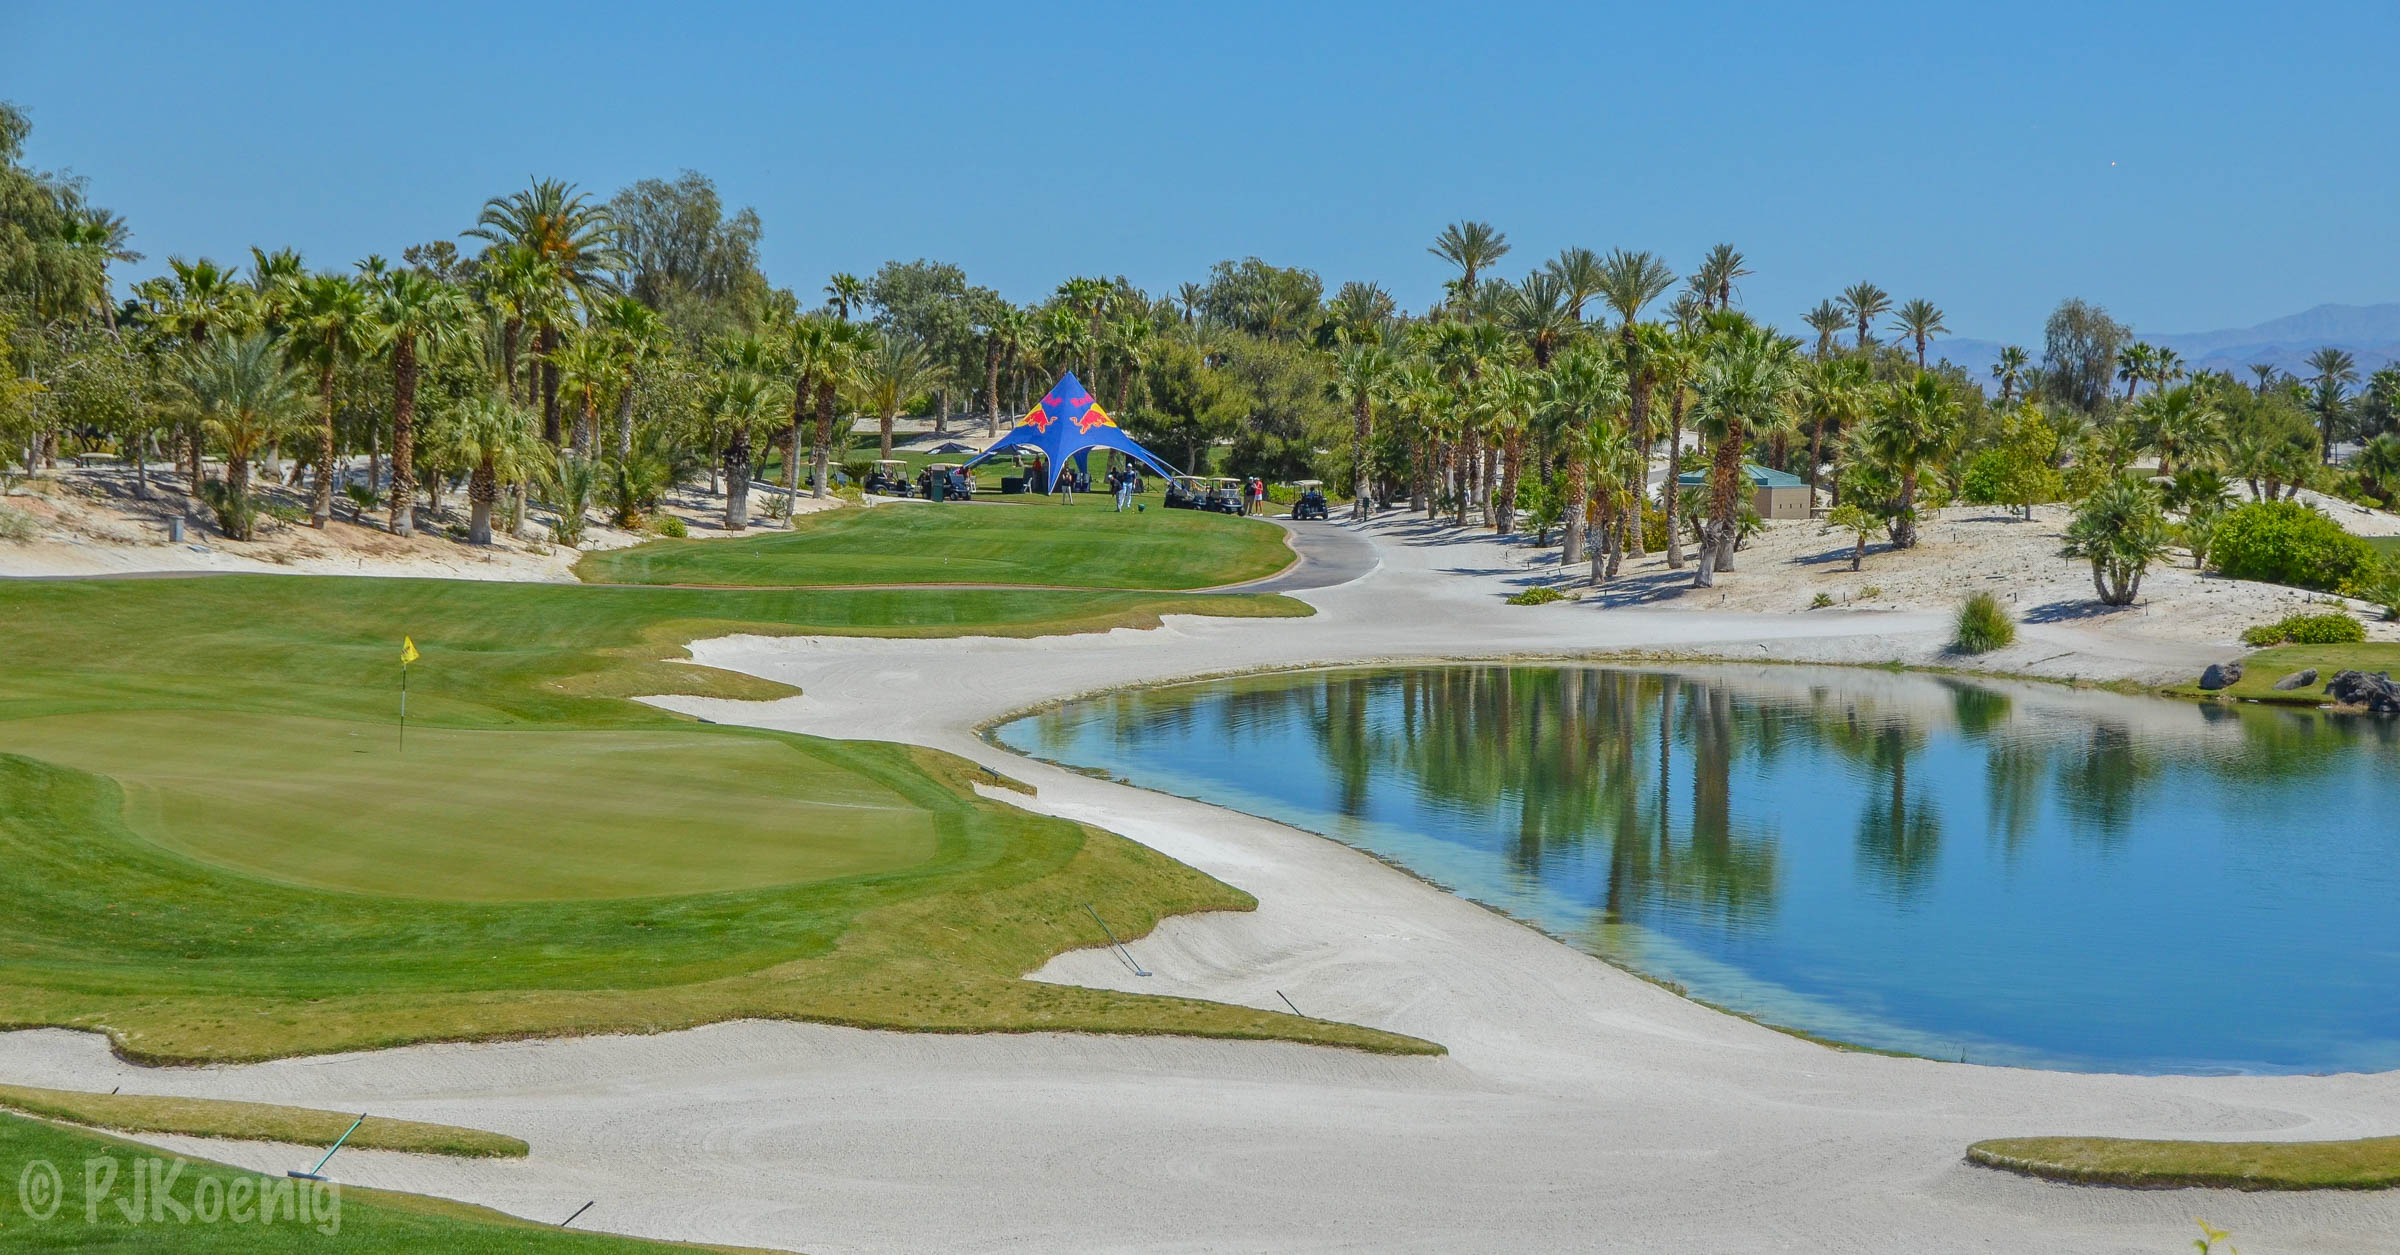 Bali Hai Golf Course - Las Vegas, NV